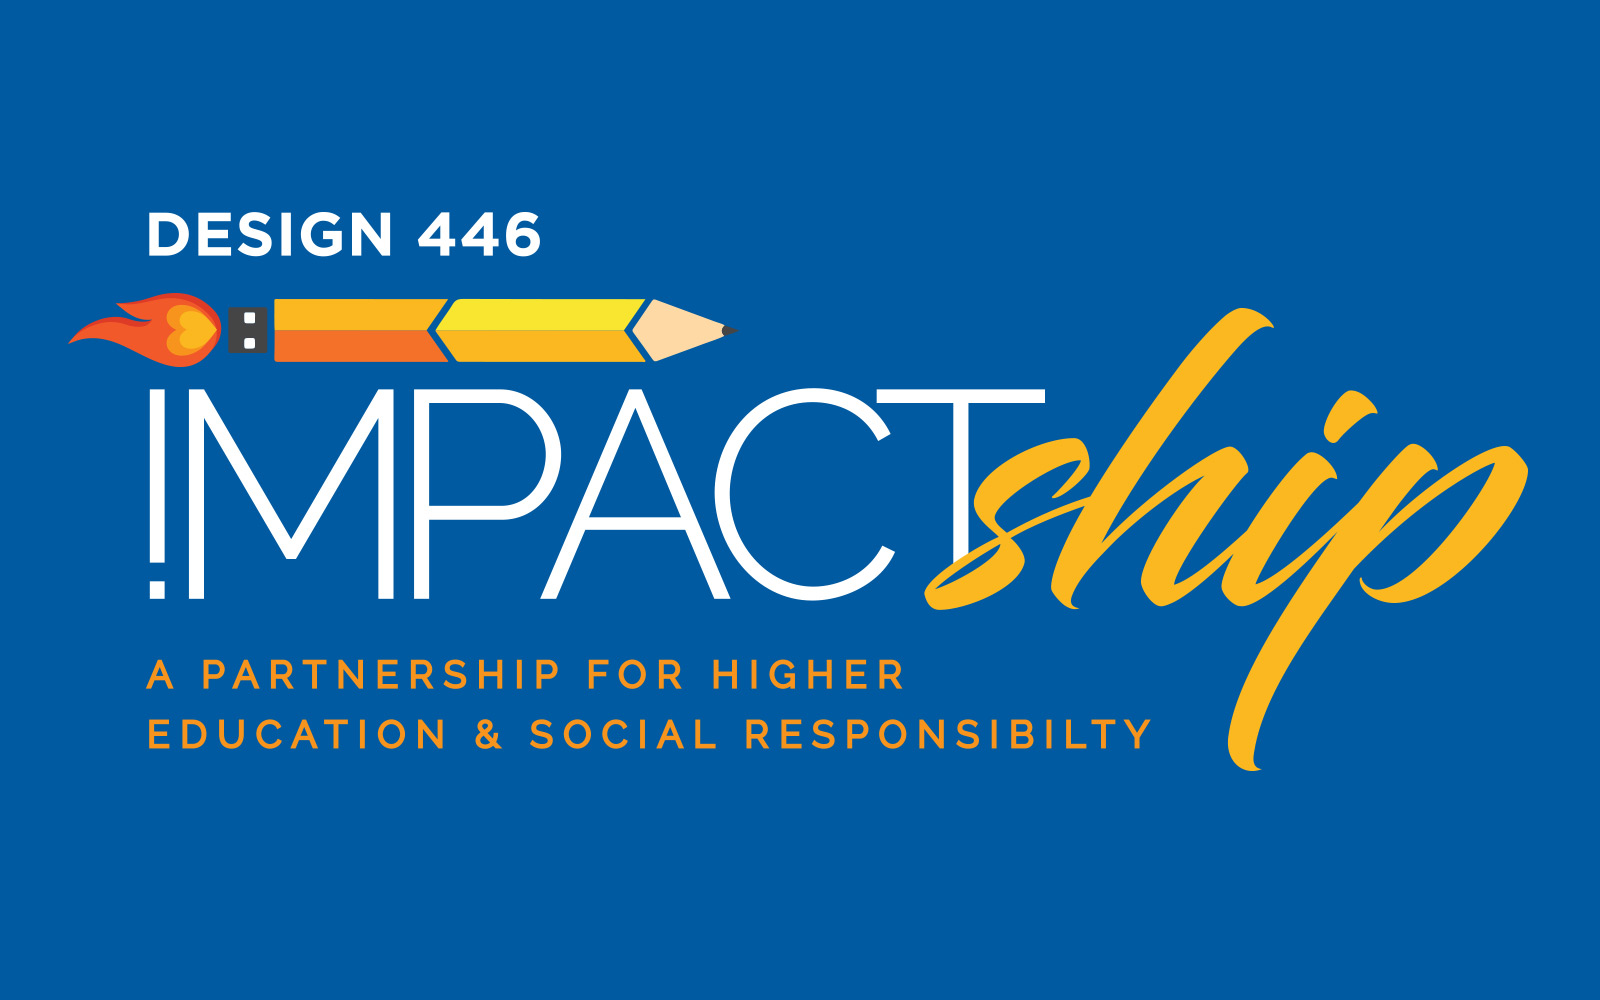 Design 446 Impactship